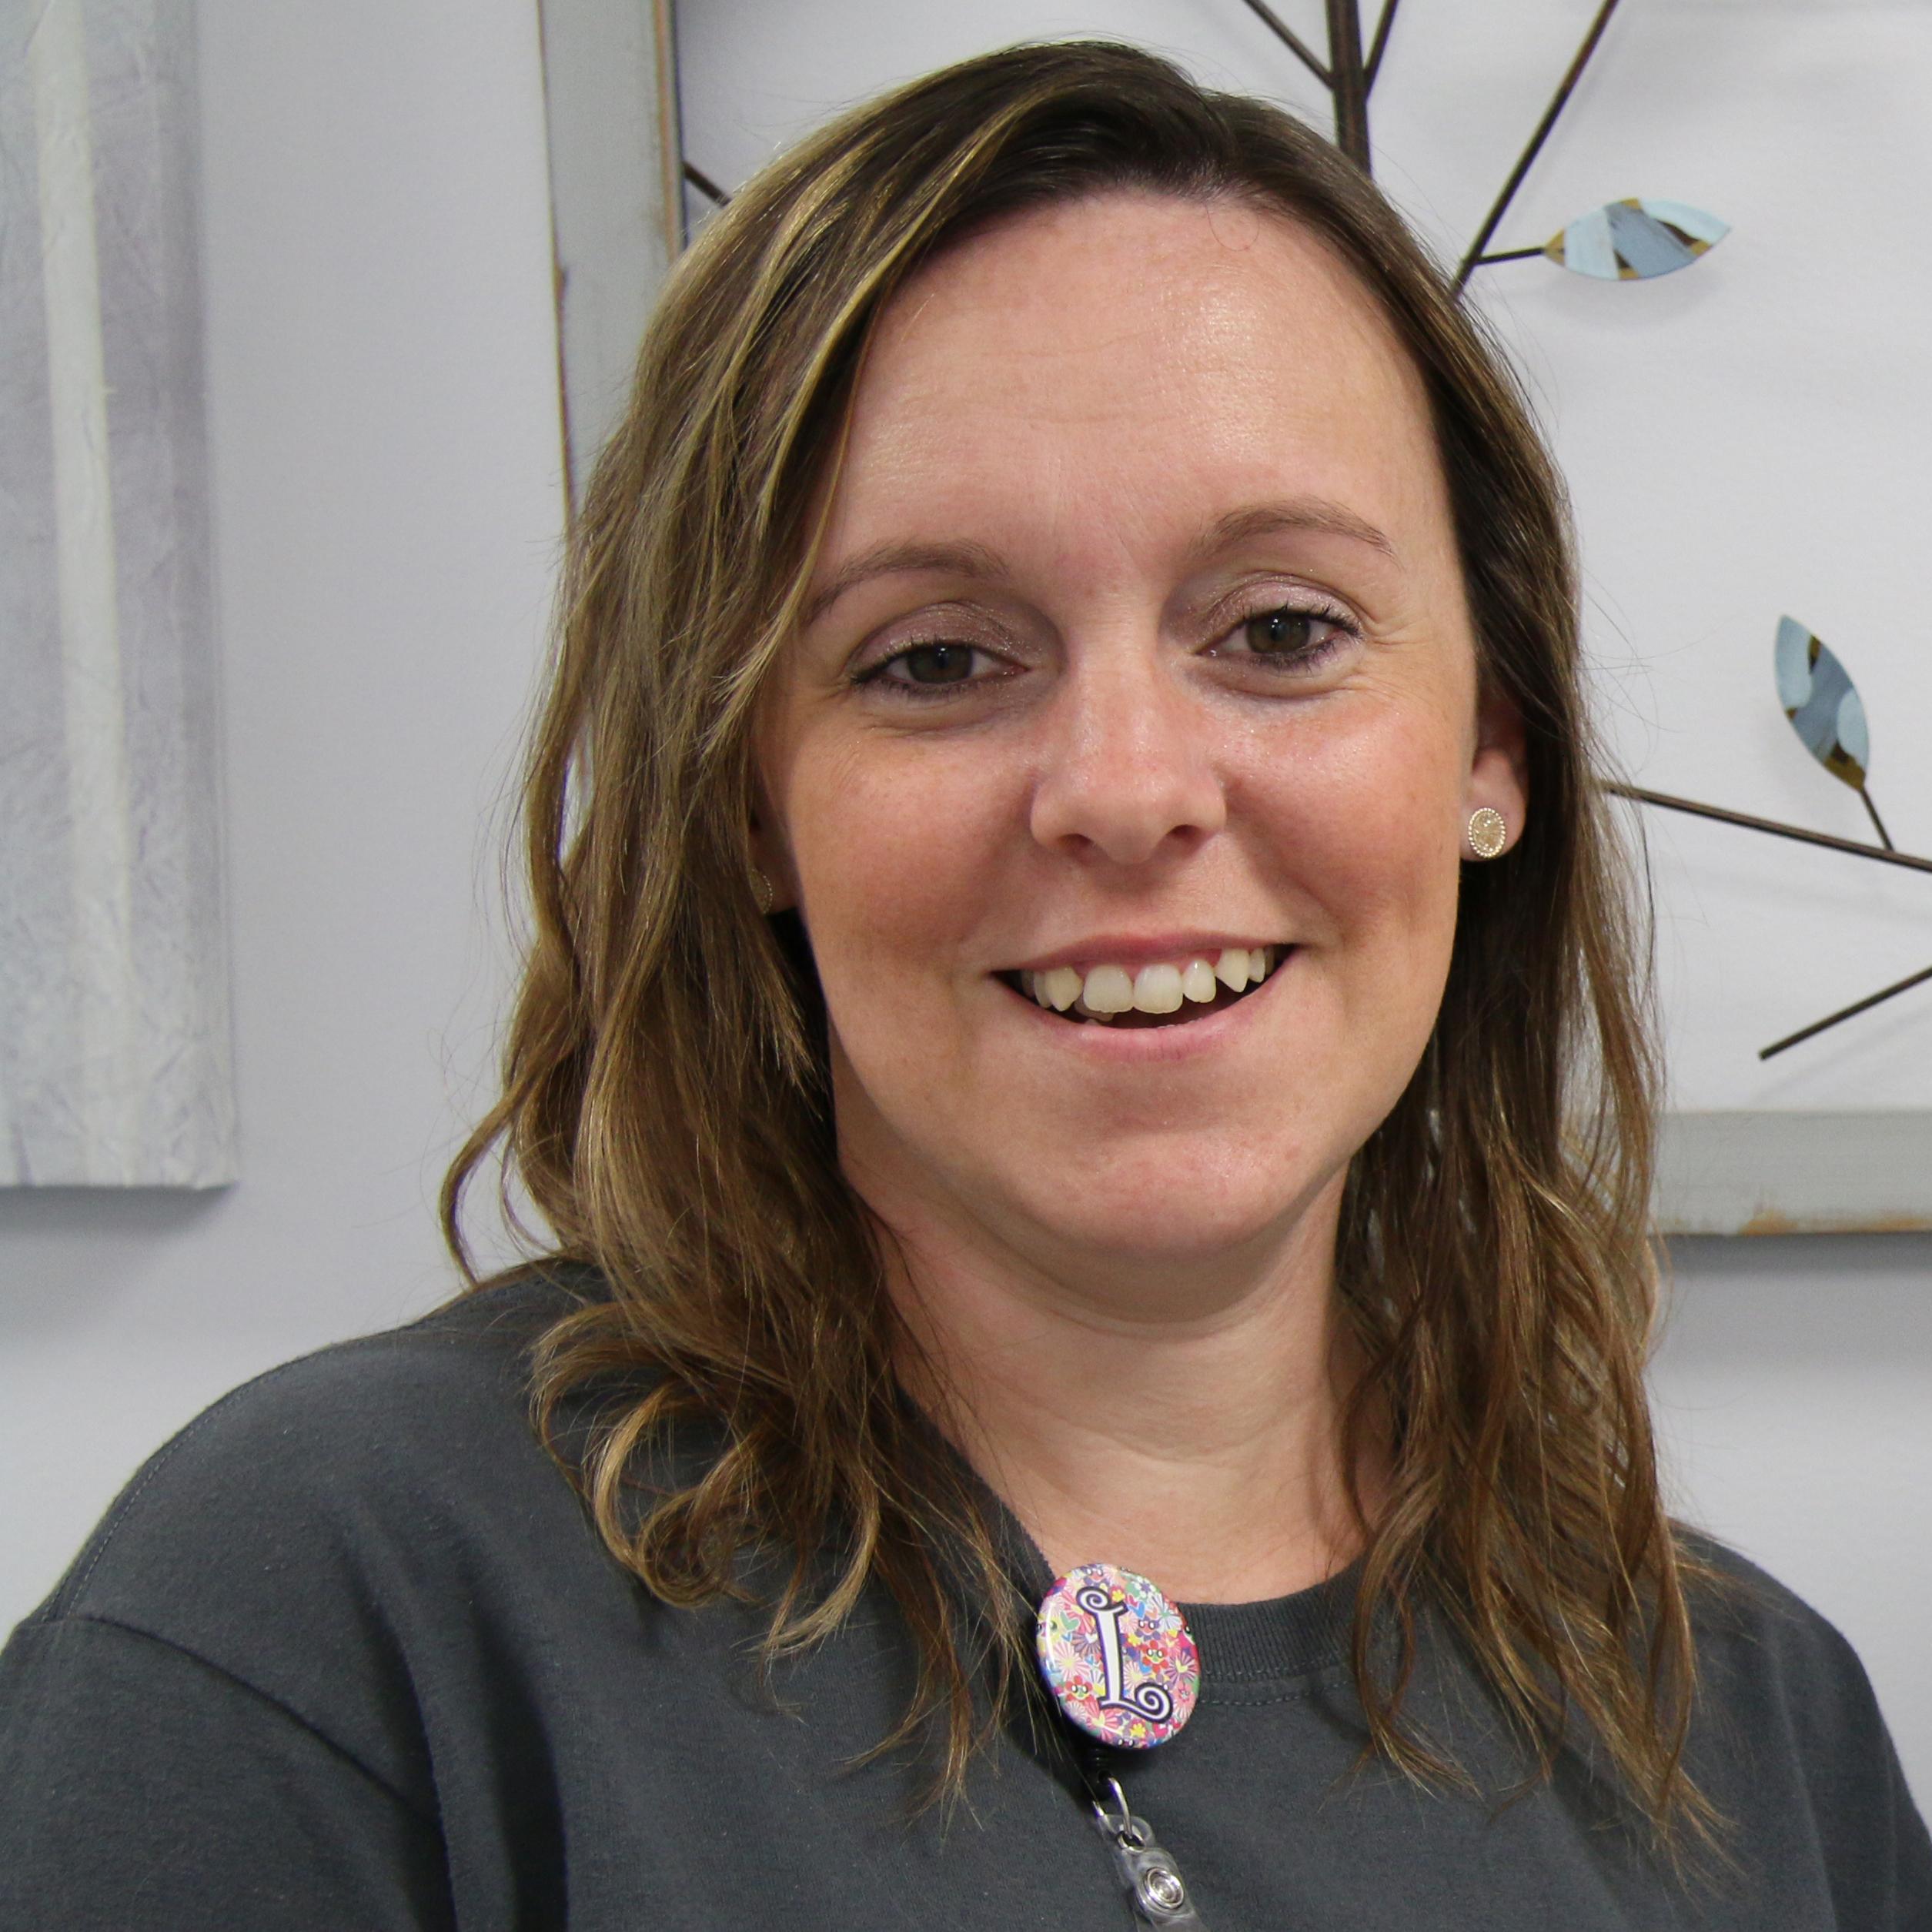 Laura Goddard